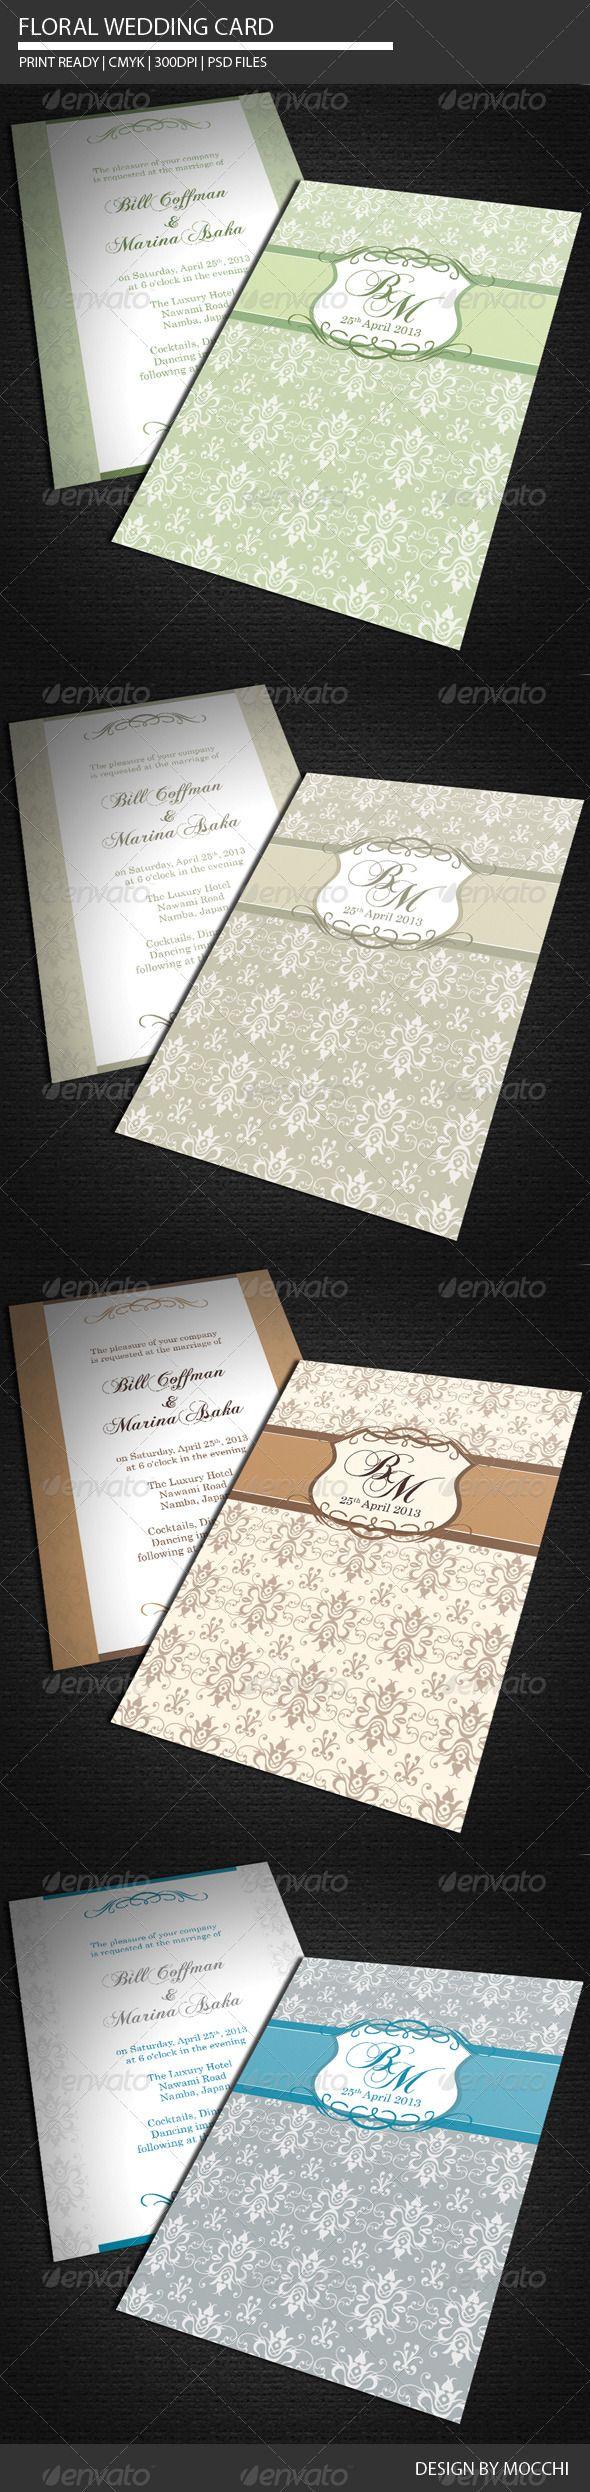 Floral Wedding Card - Weddings Cards & Invites